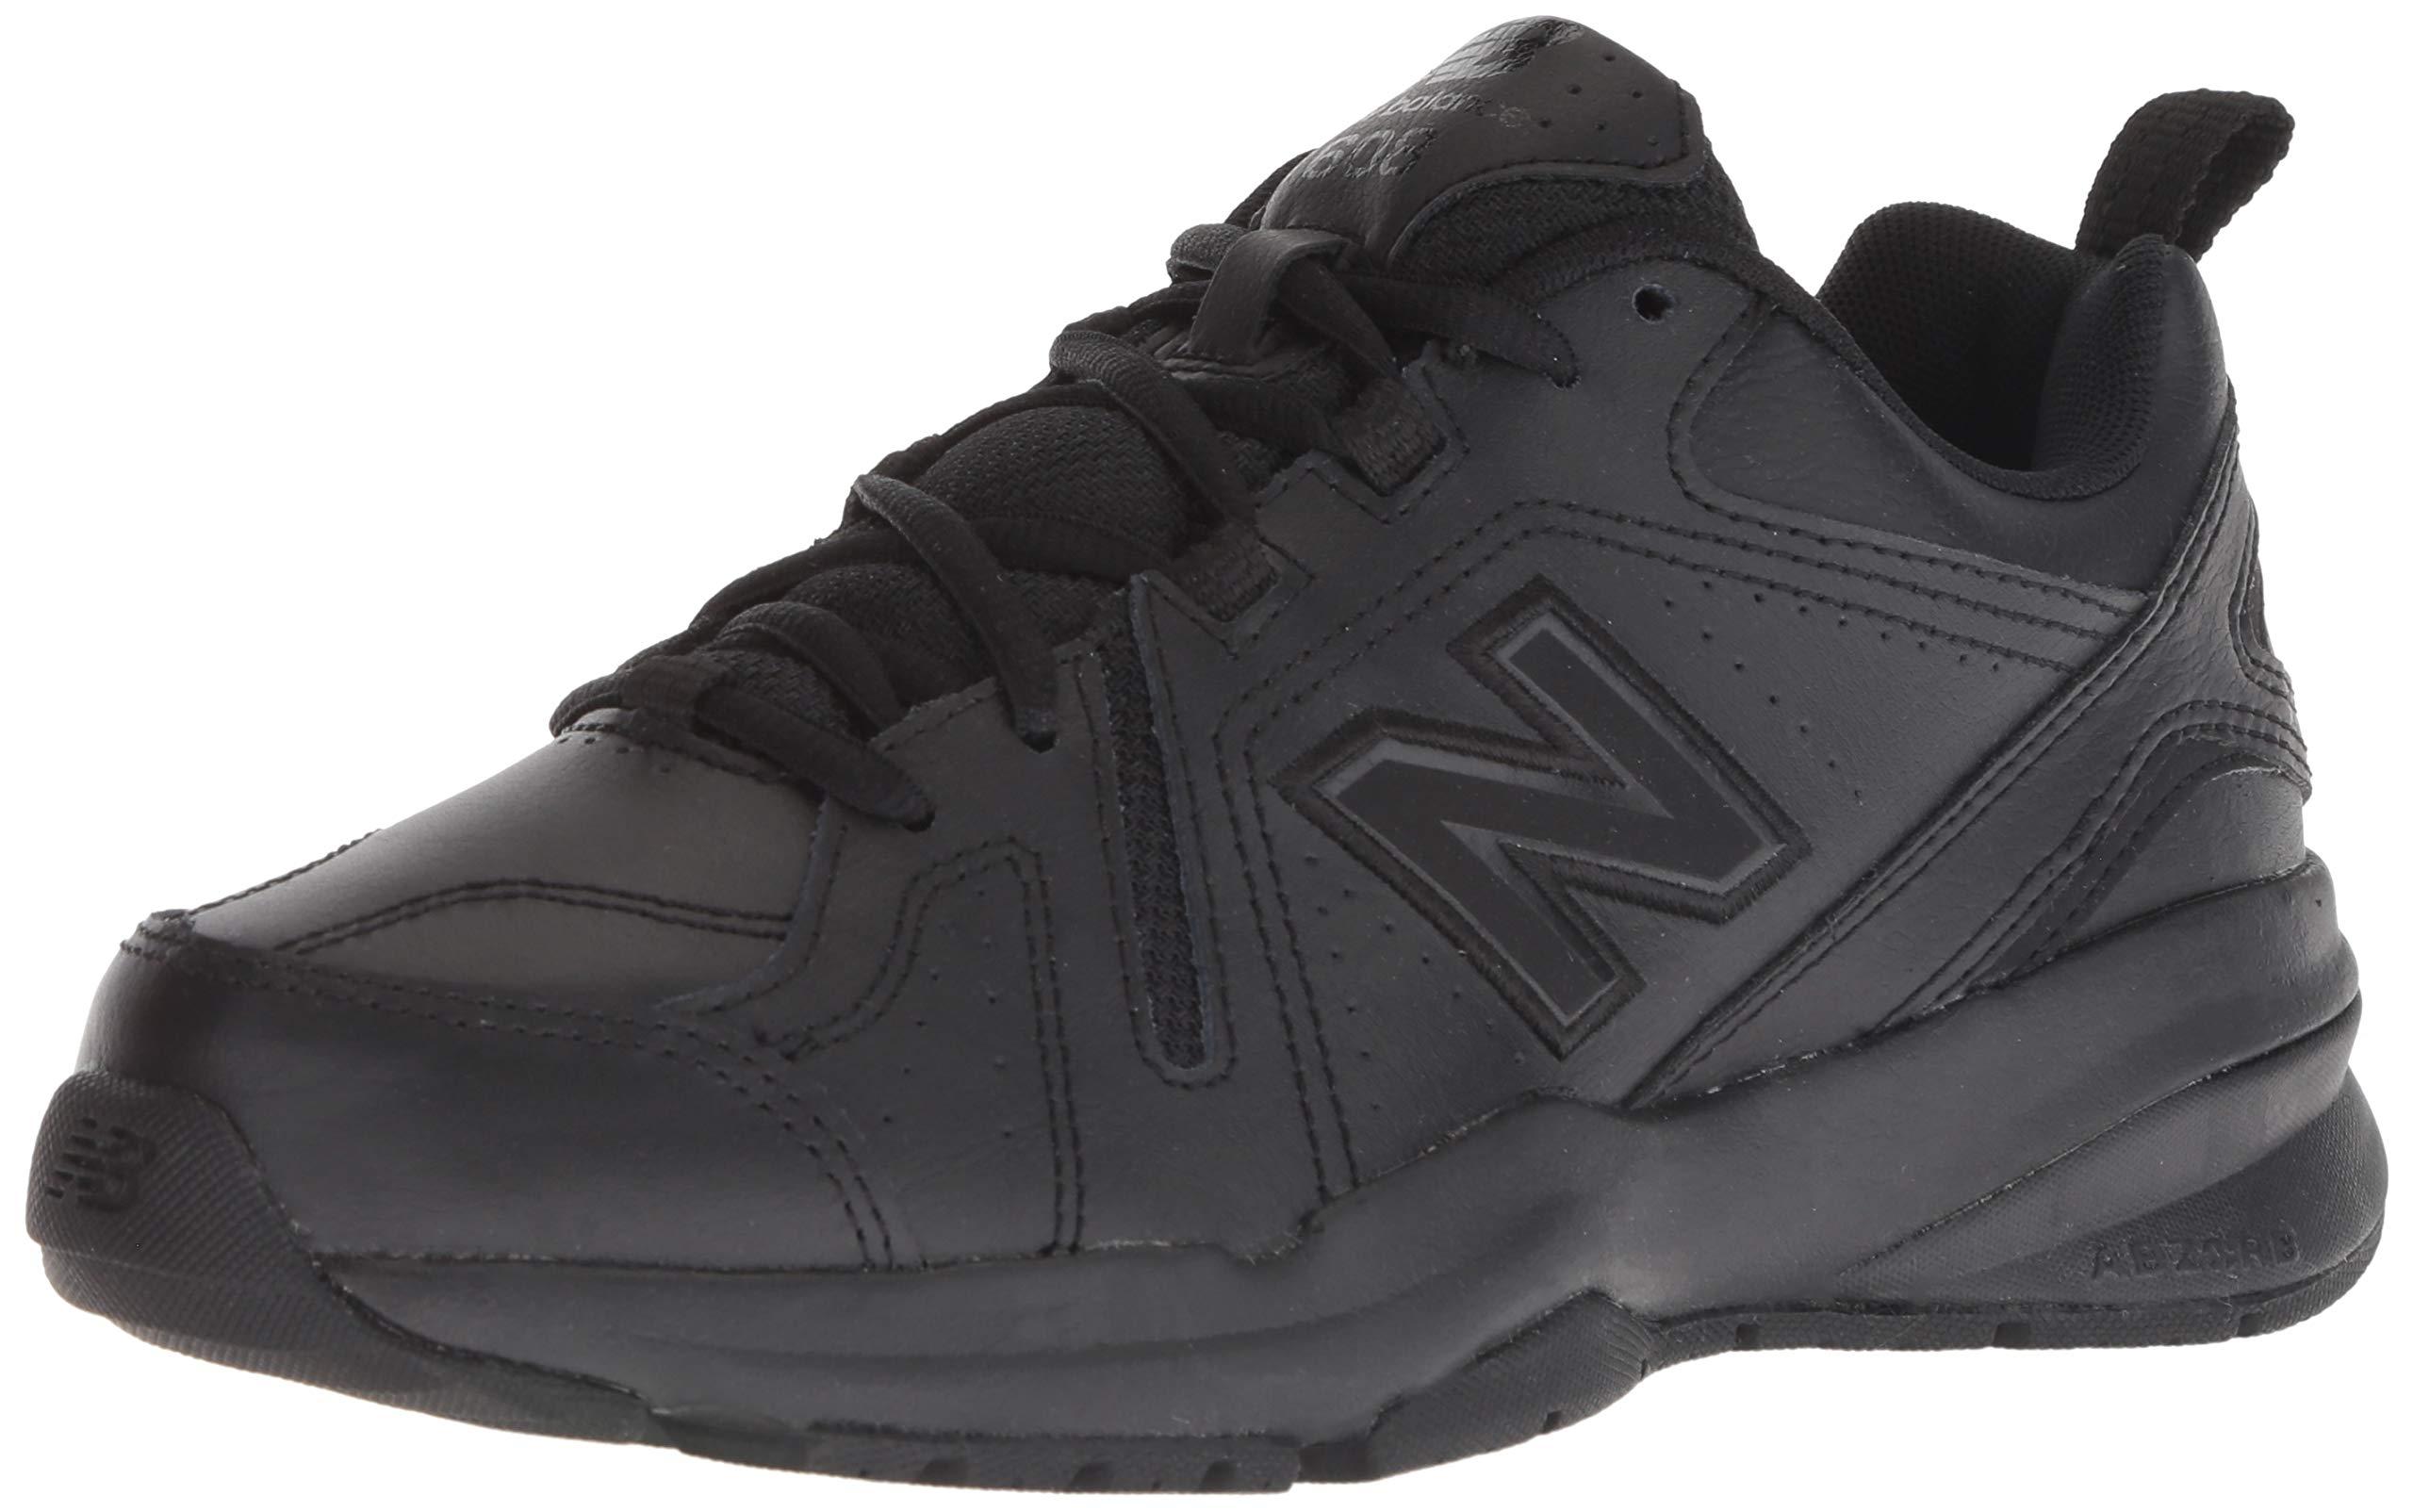 New Balance Women's 608v5 Casual Comfort Cross Trainer, Black, 5 B US